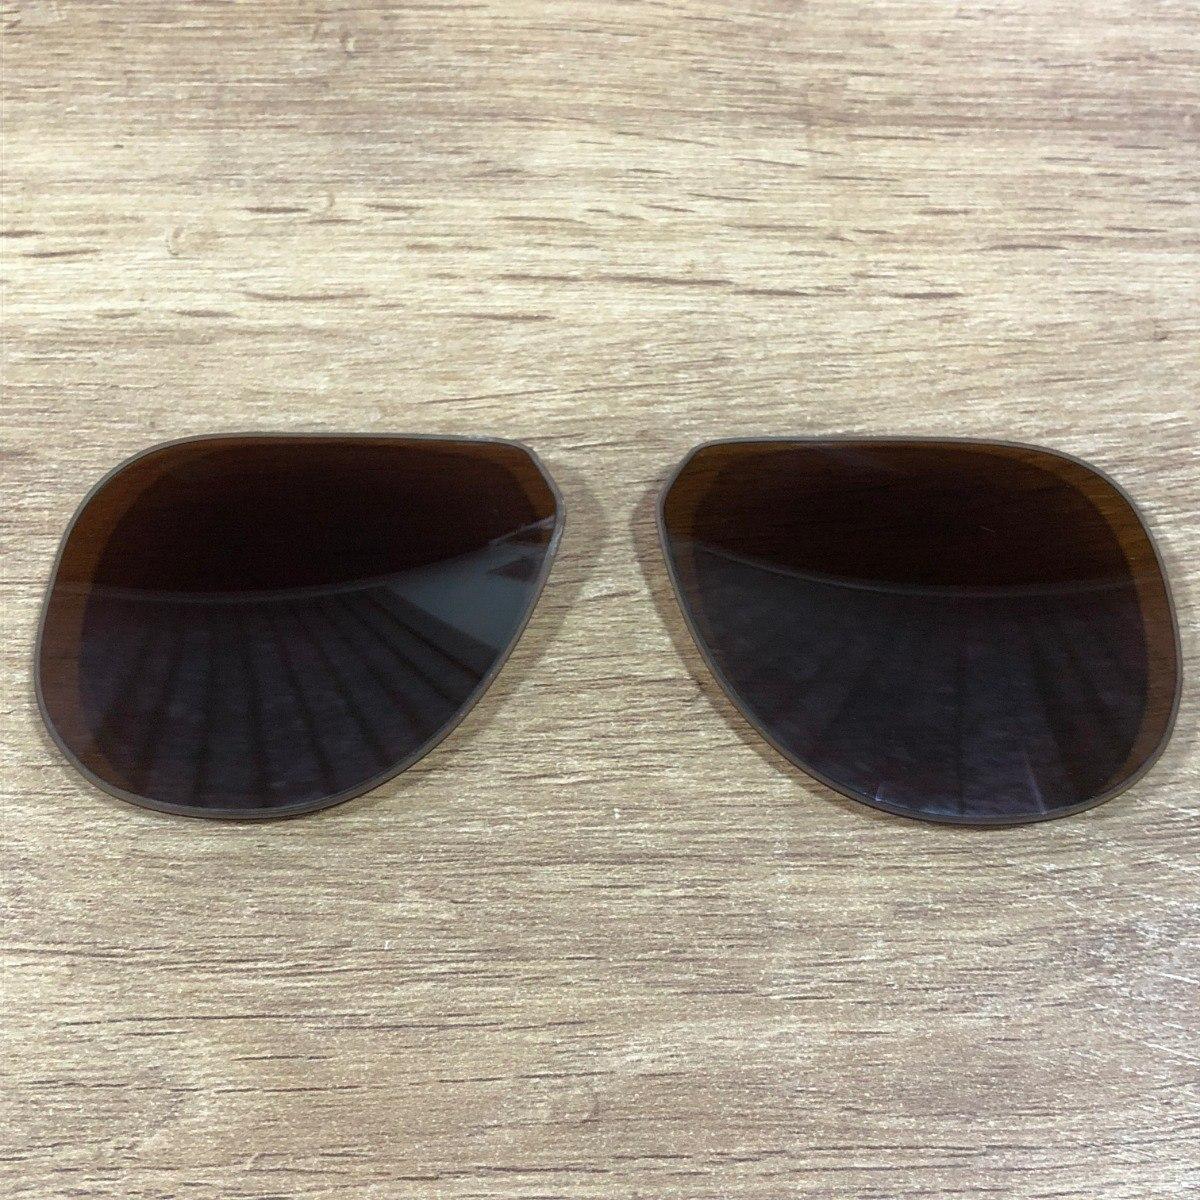 a9d0a2cbd Lentes Xperio Óculos Mormaii Flexxxa Brilho Azul Espelhado - R$ 79 ...